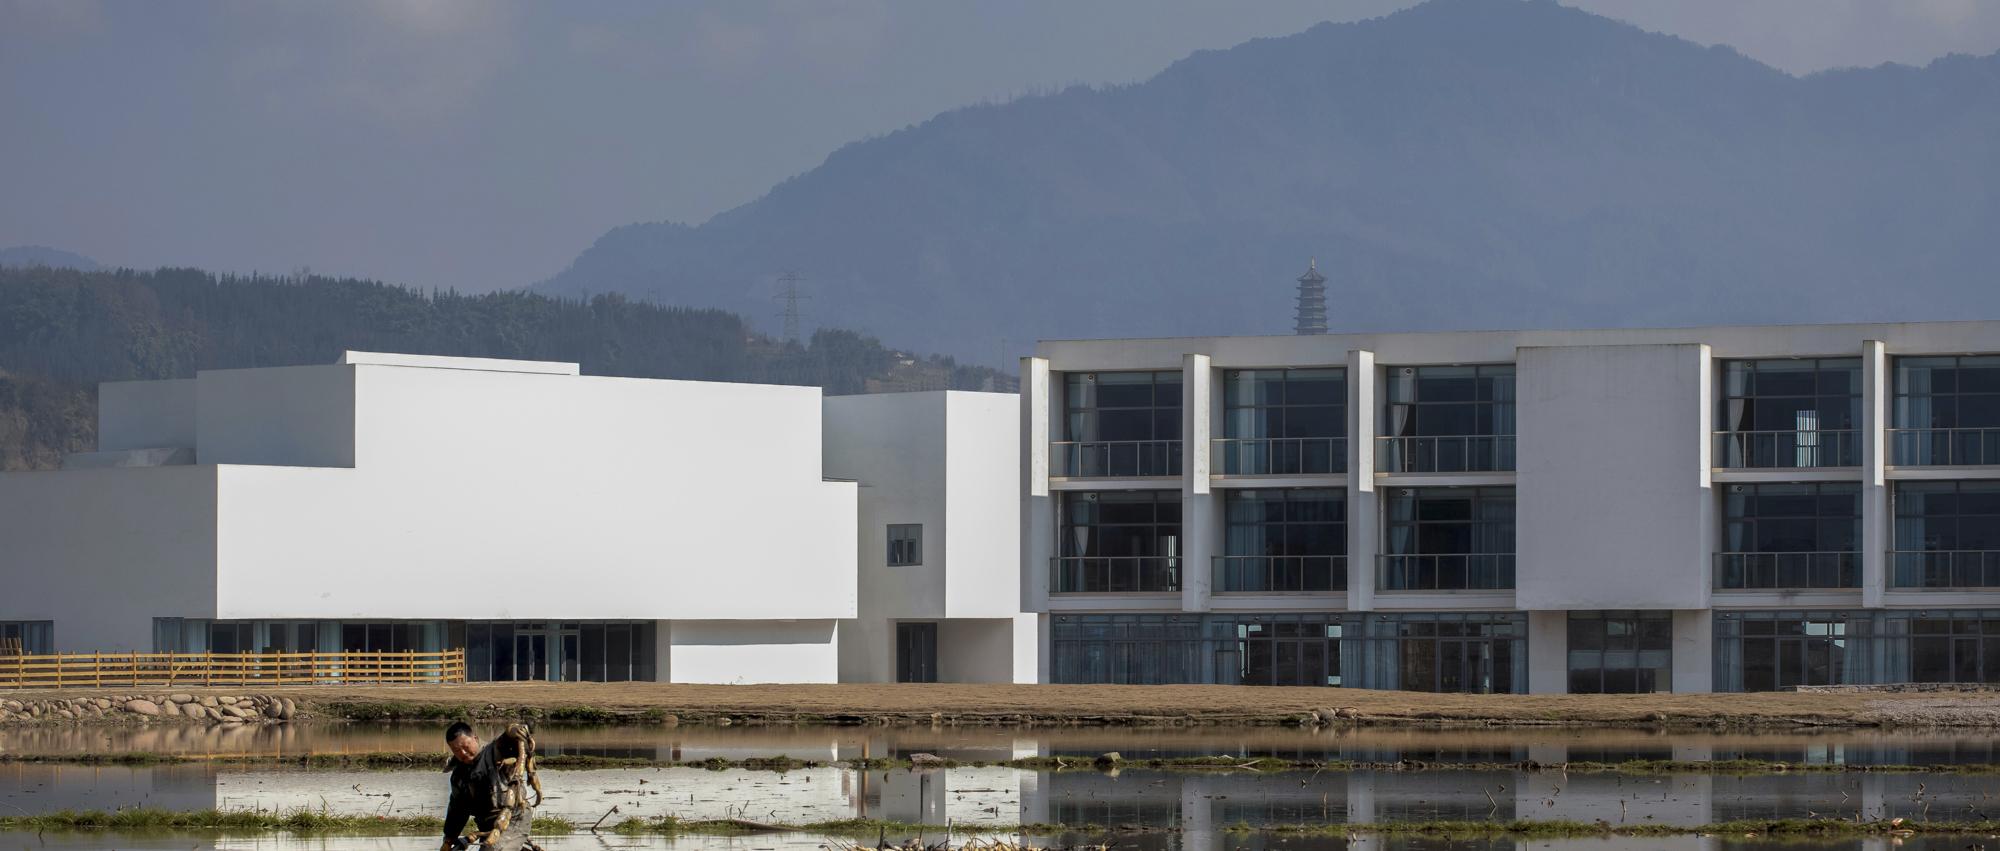 a9a 建筑设计事务所 / 荥窑砂器博物馆